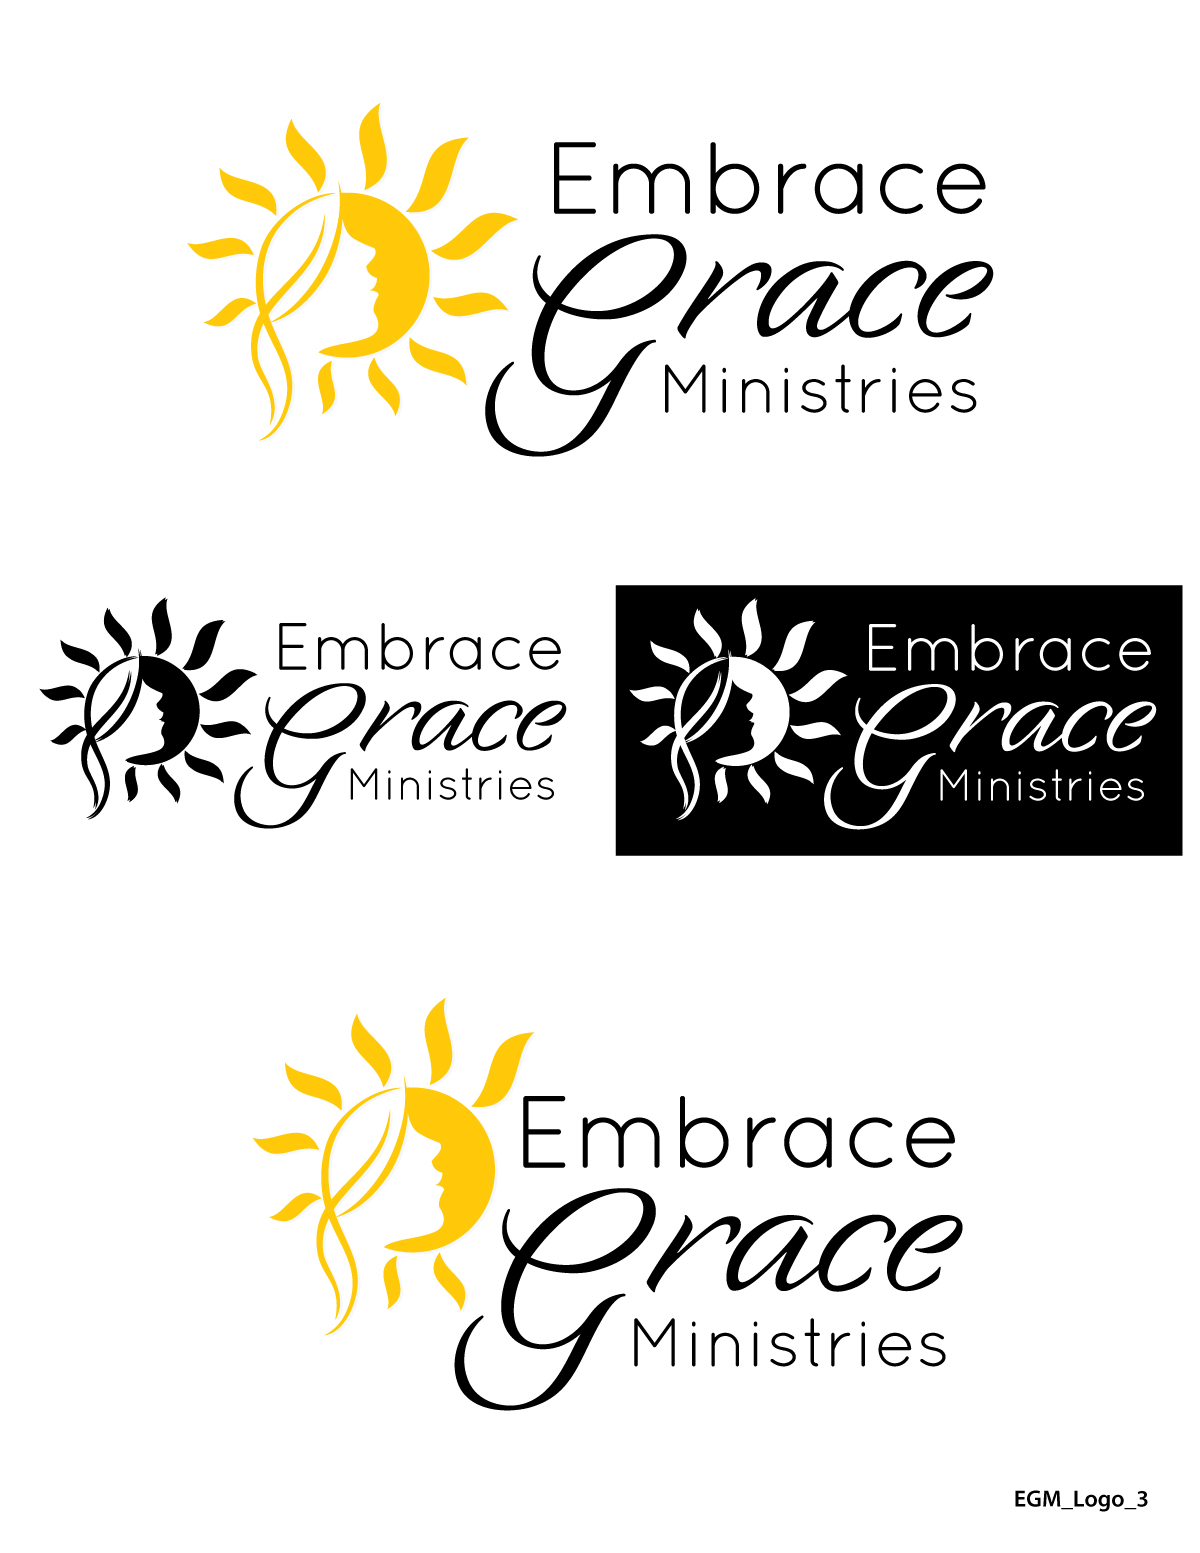 EGM_Logo_3.jpg